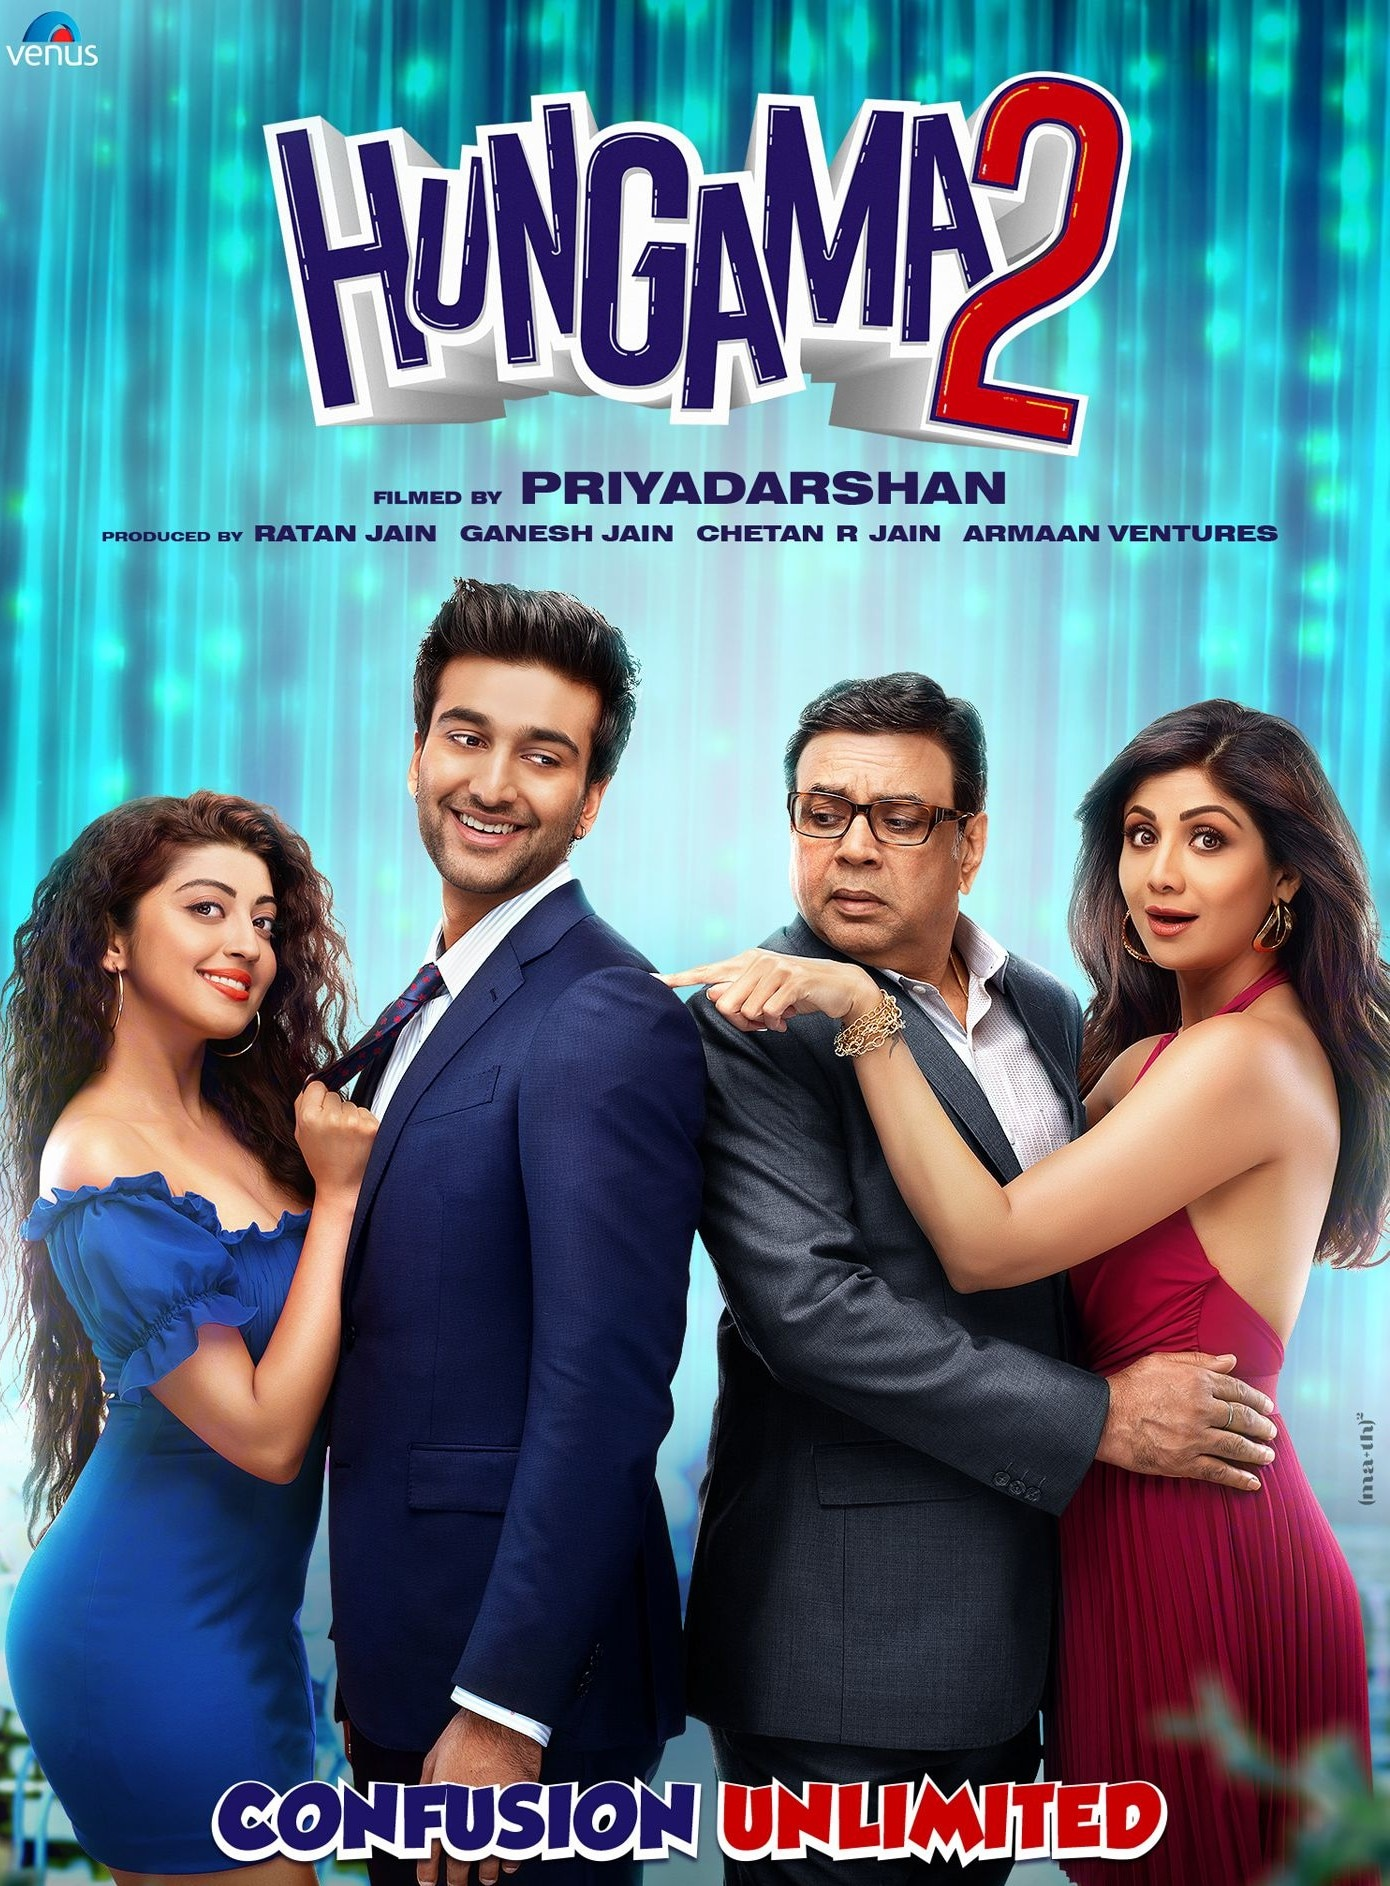 फिल्म 'हंगामा 2' का पोस्टर.